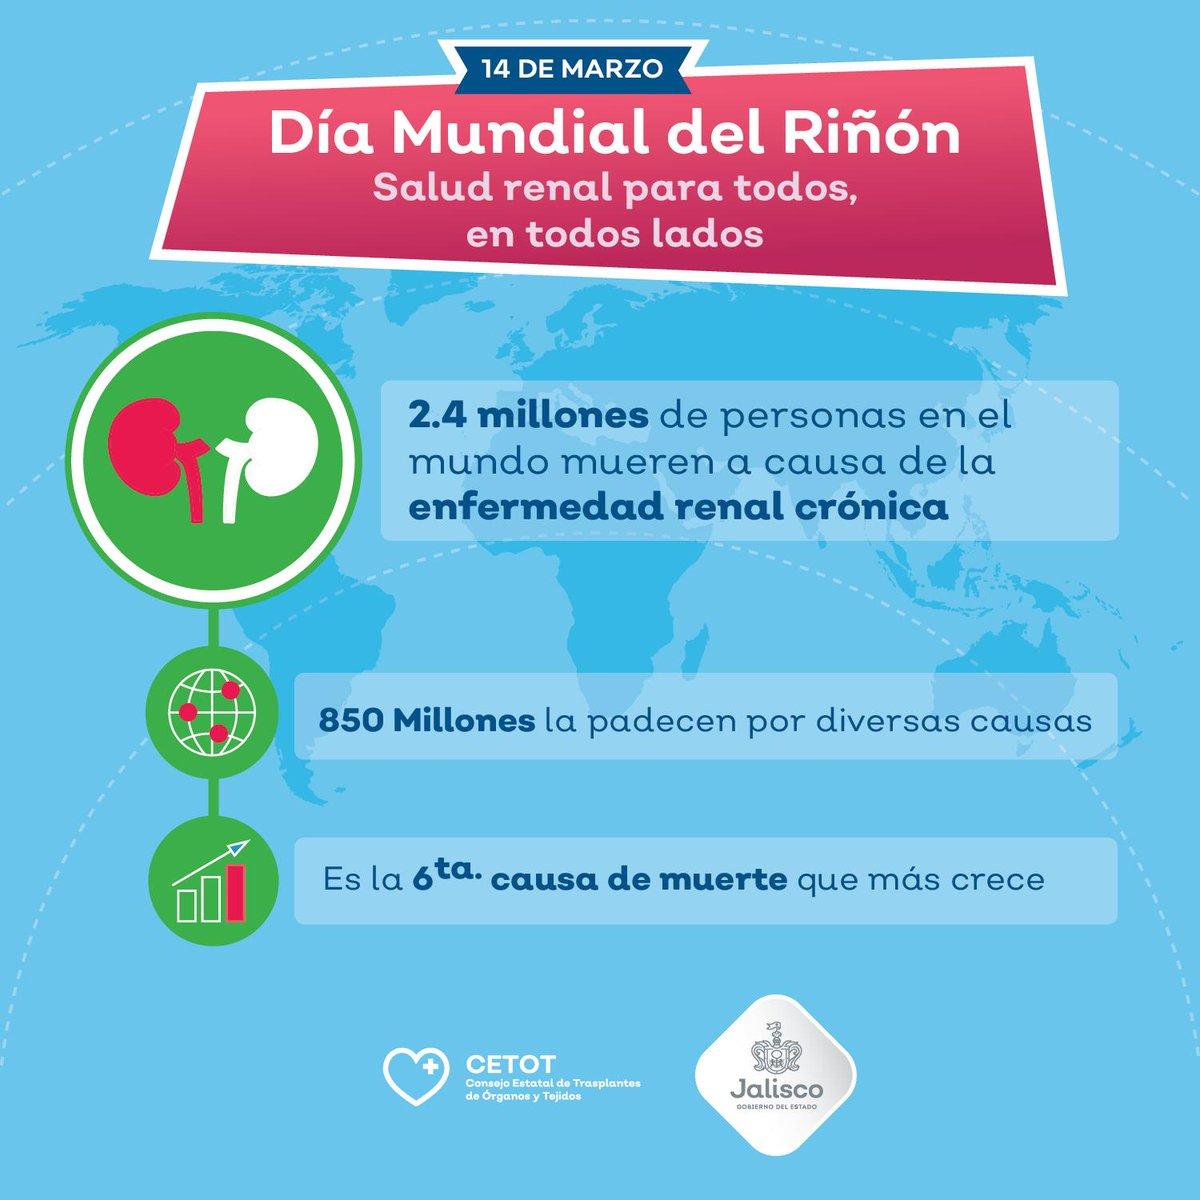 TrasplantesJalisco's photo on #DíaMundialDelRiñón